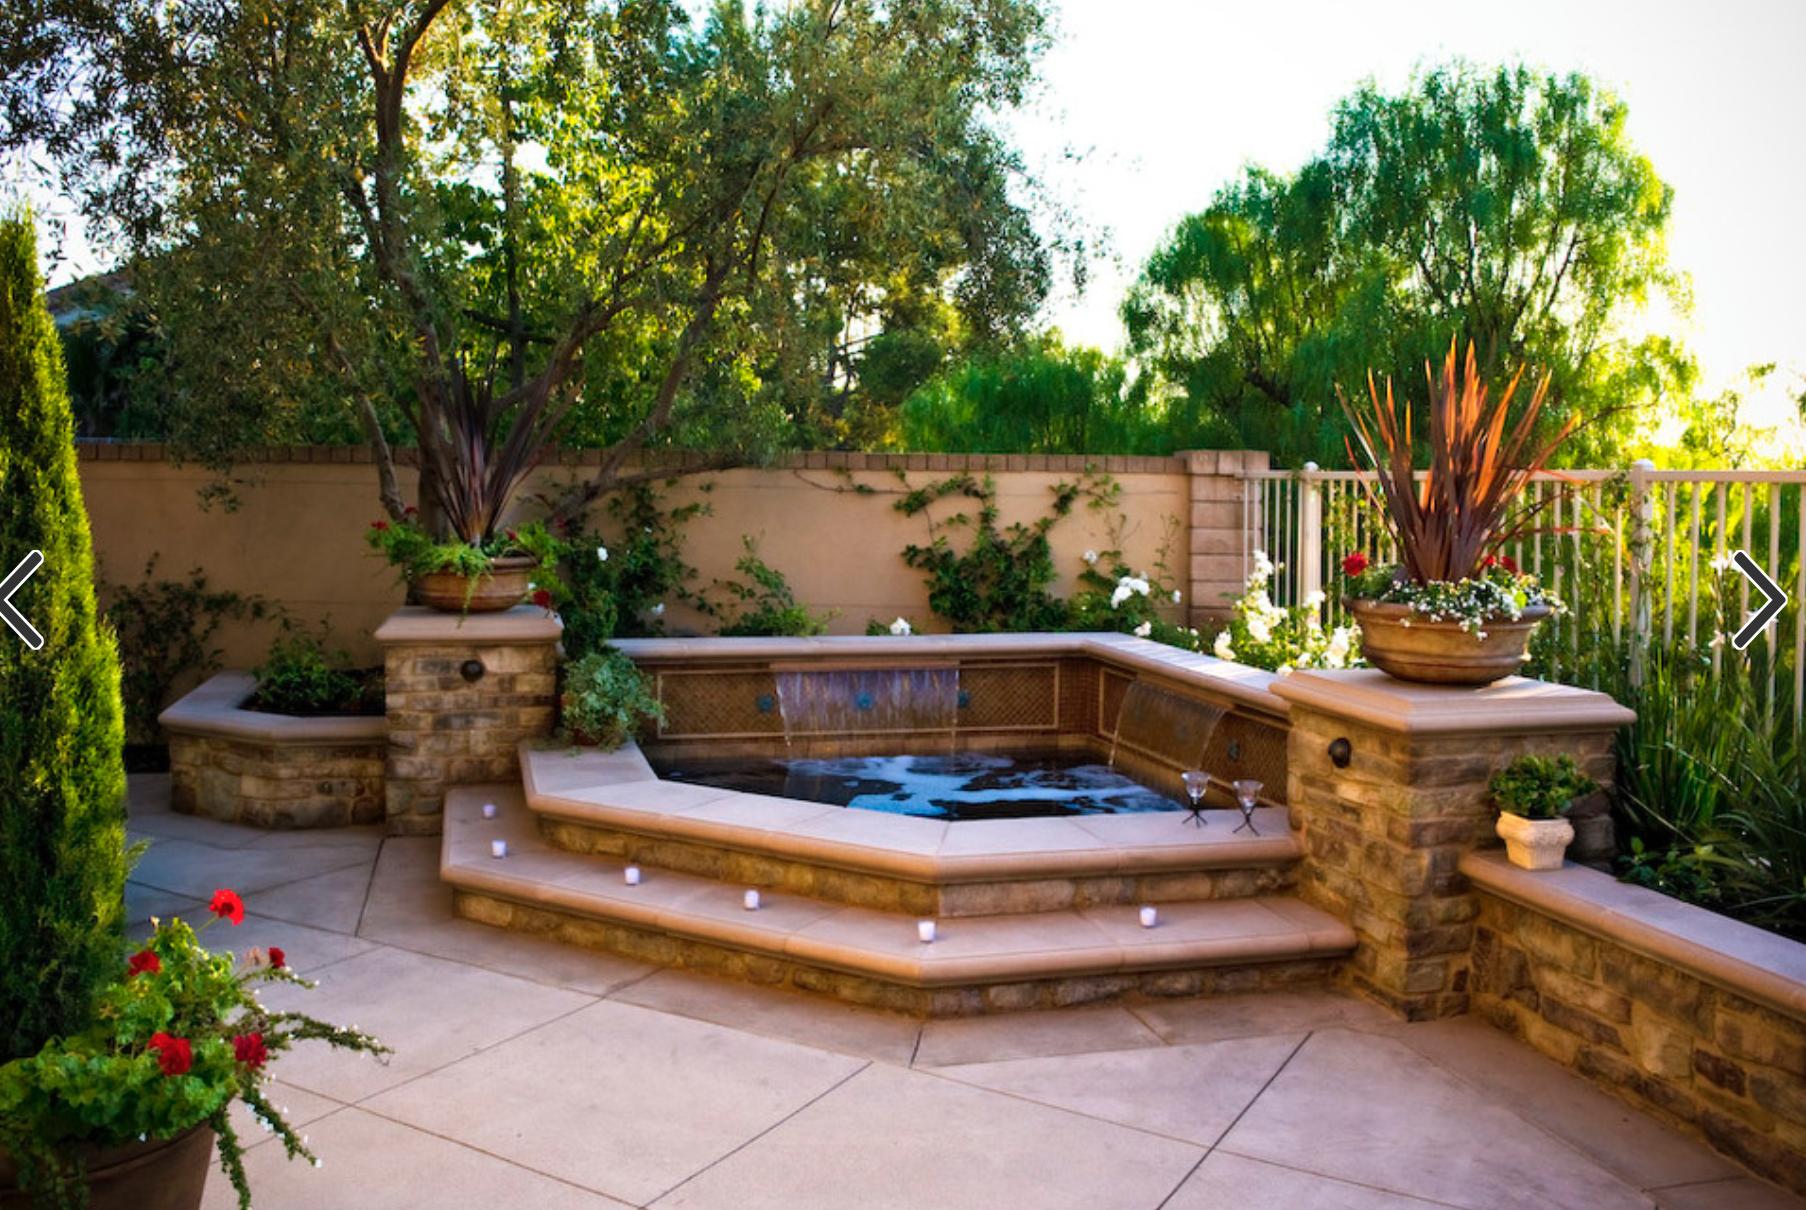 Amazing Small Backyard Jacuzzi Ideas - tyuka.info  Hot tub